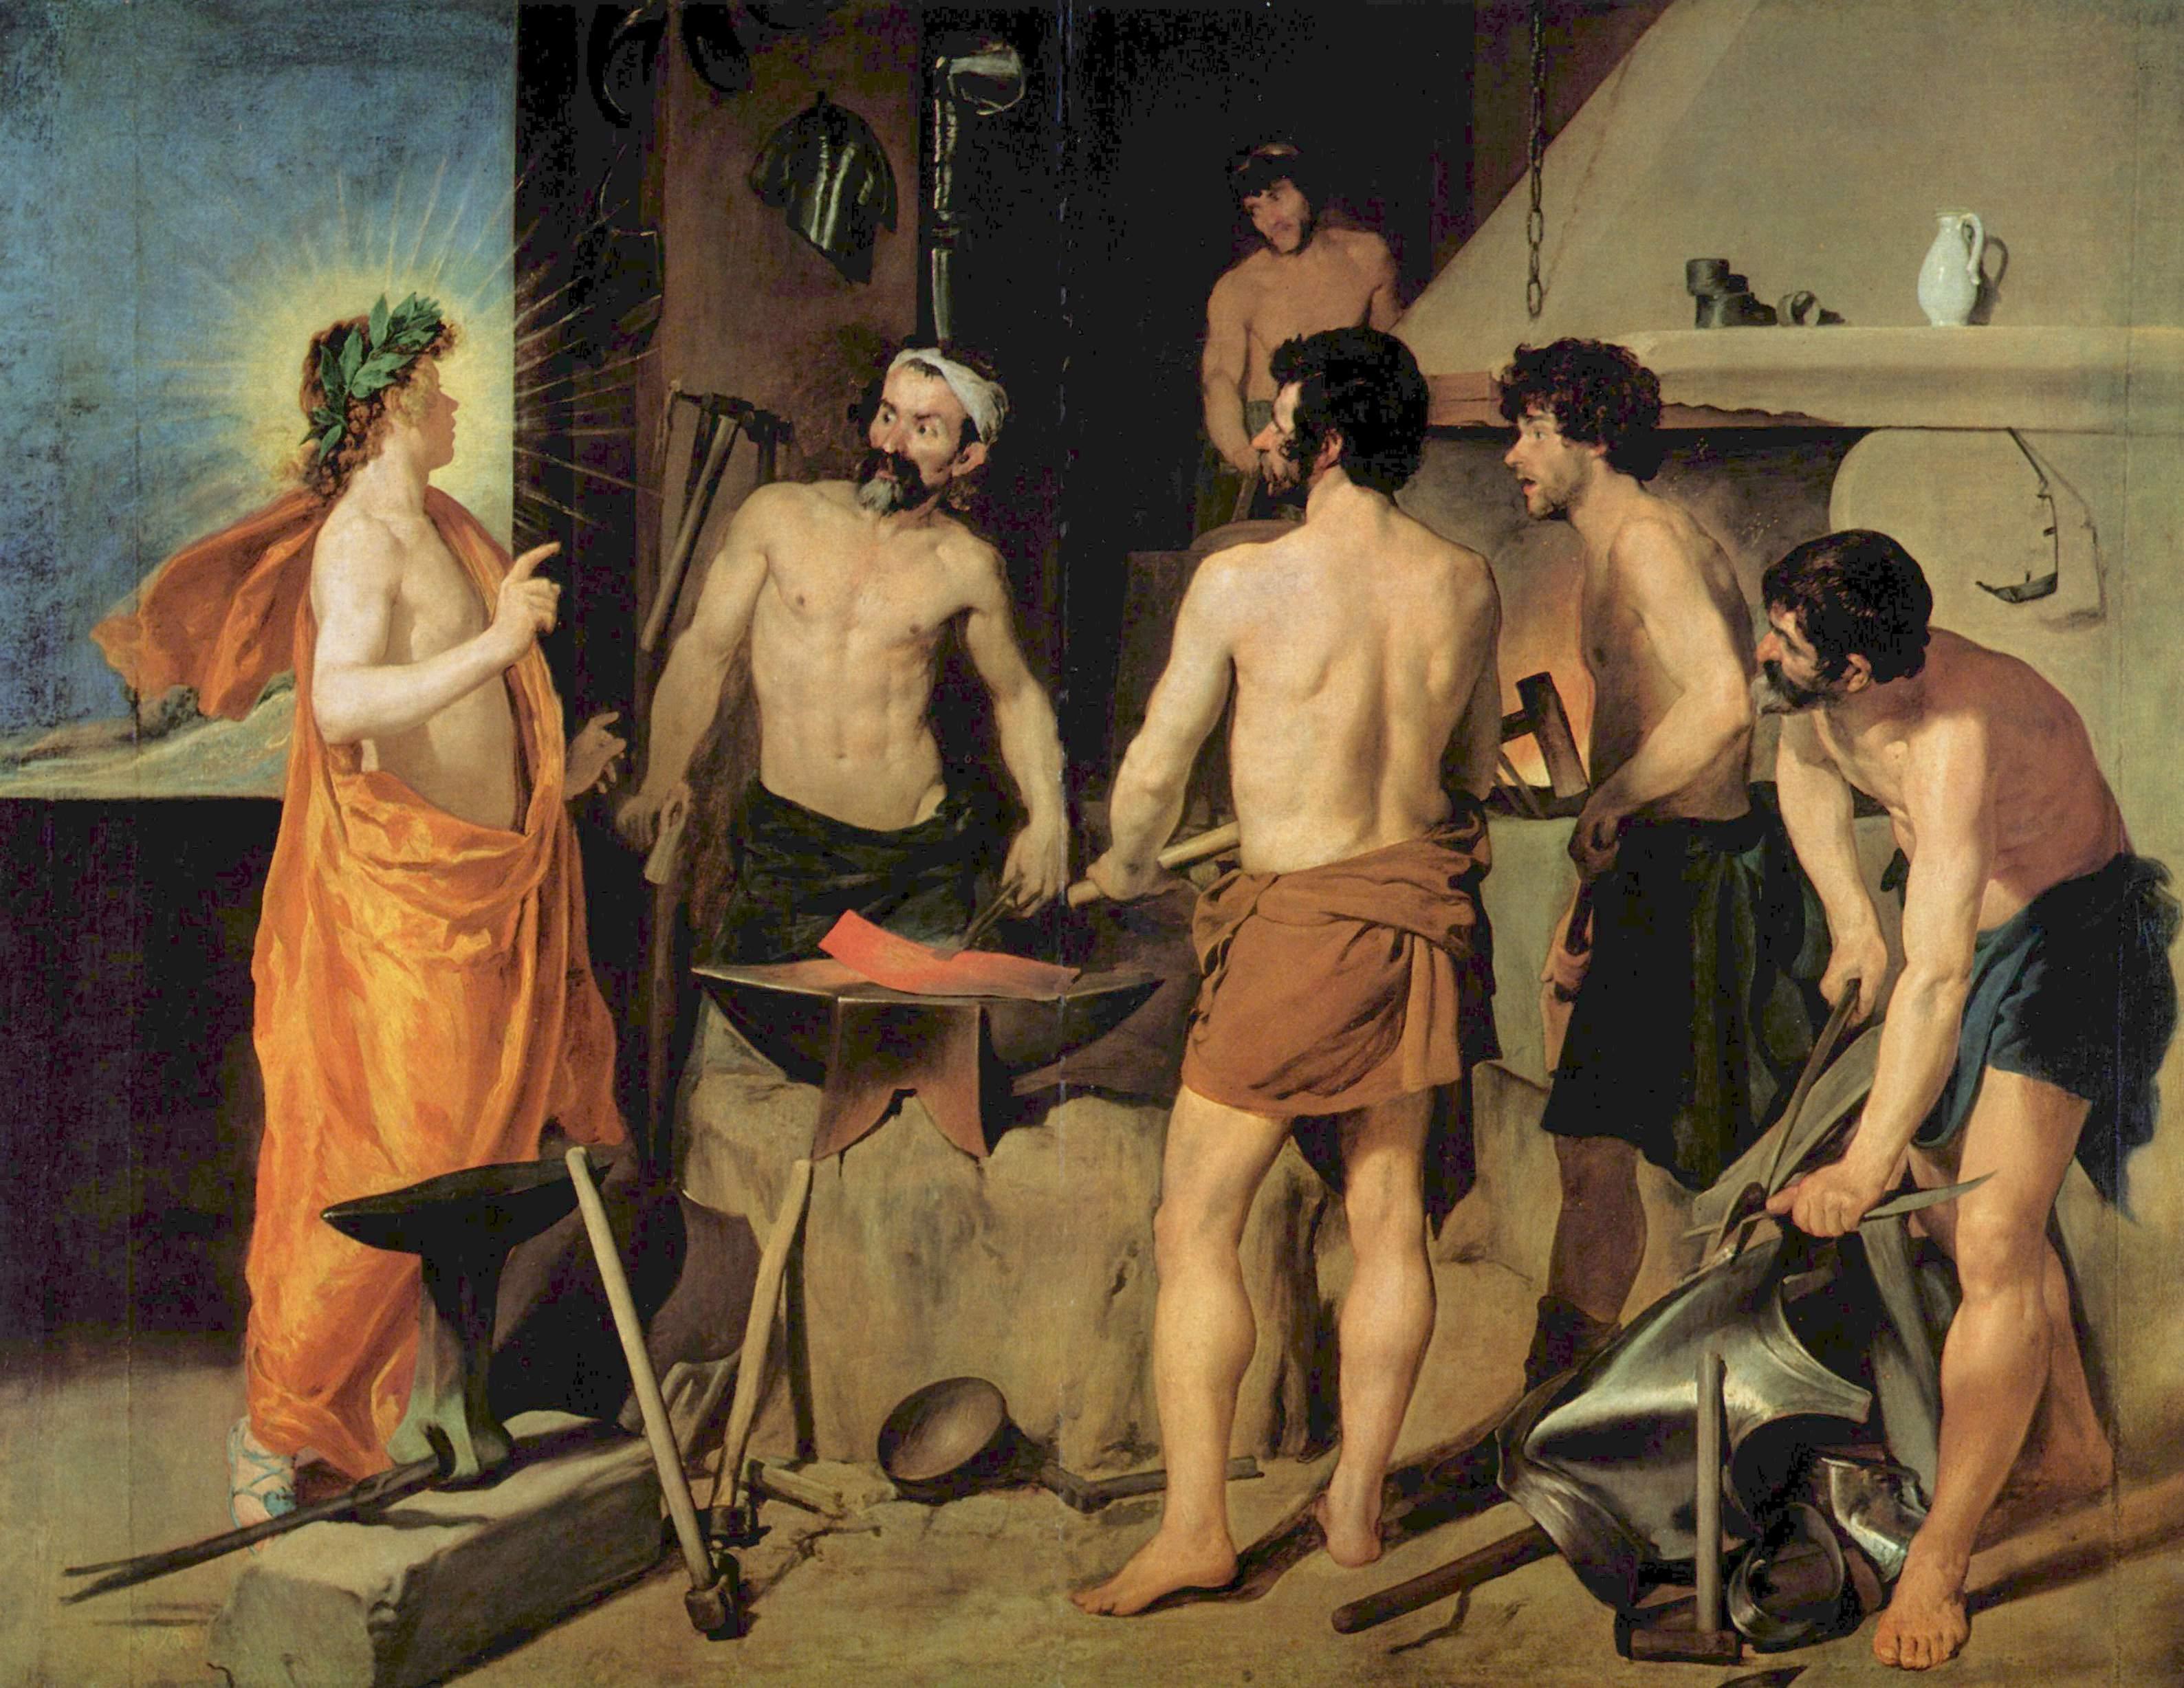 Diego Velázquez - La fragua de Vulcano   Artelista.com